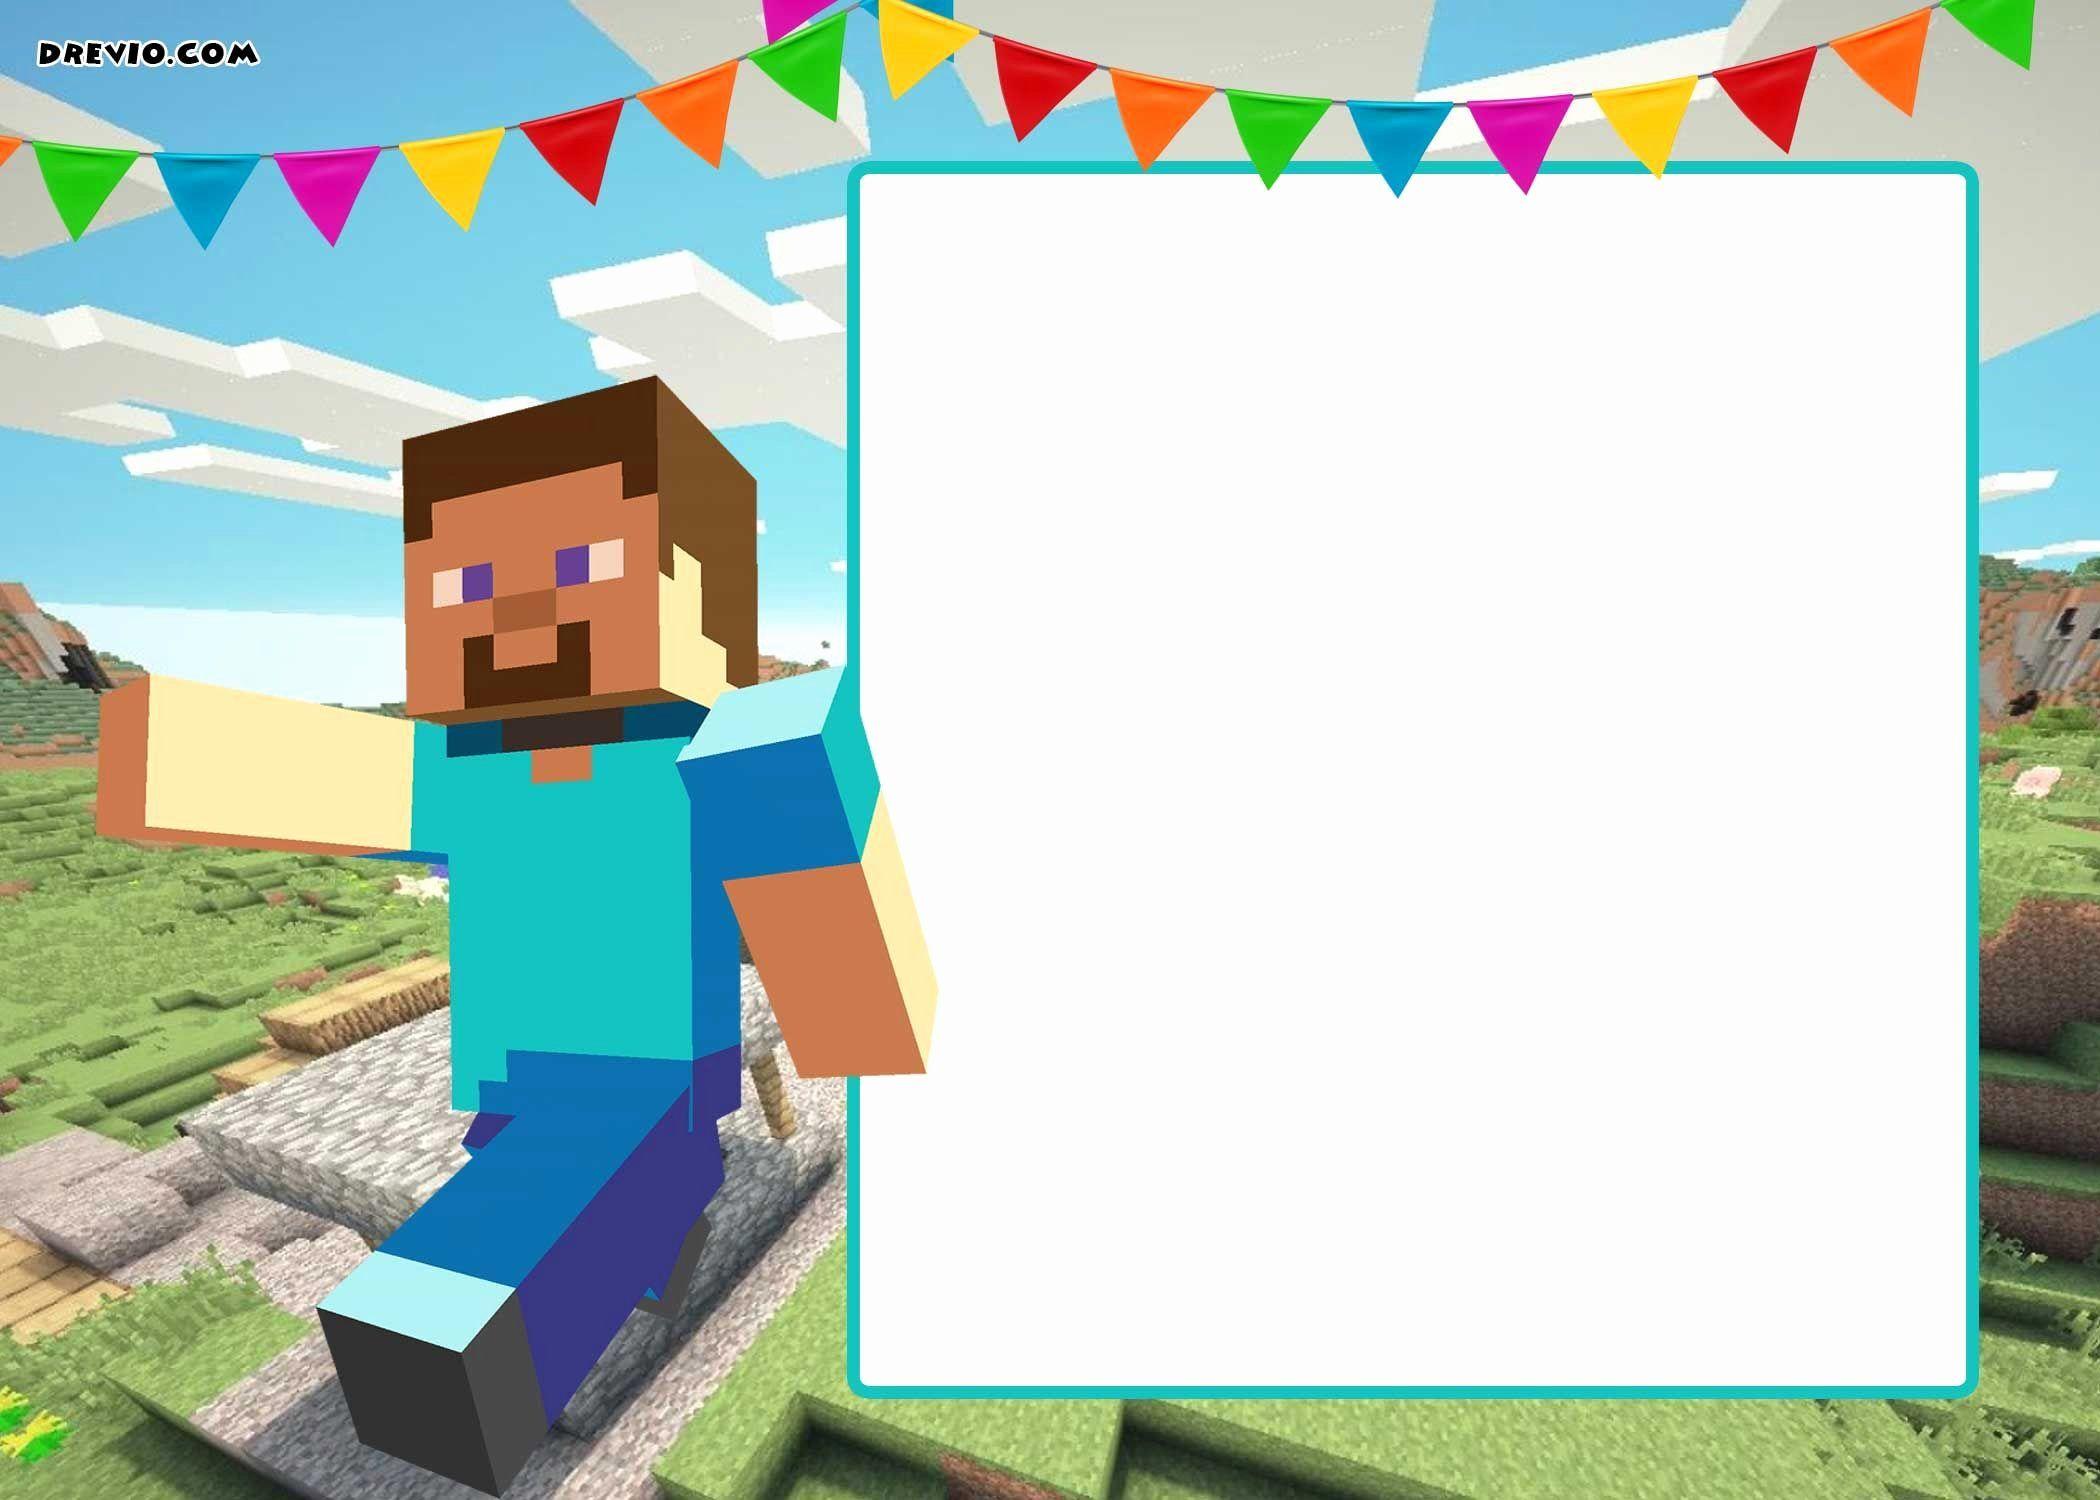 Minecraft Birthday Invite Template Elegant Free Printable Minecraft Birthday Minecraft Birthday Card Minecraft Party Invitations Minecraft Birthday Invitations